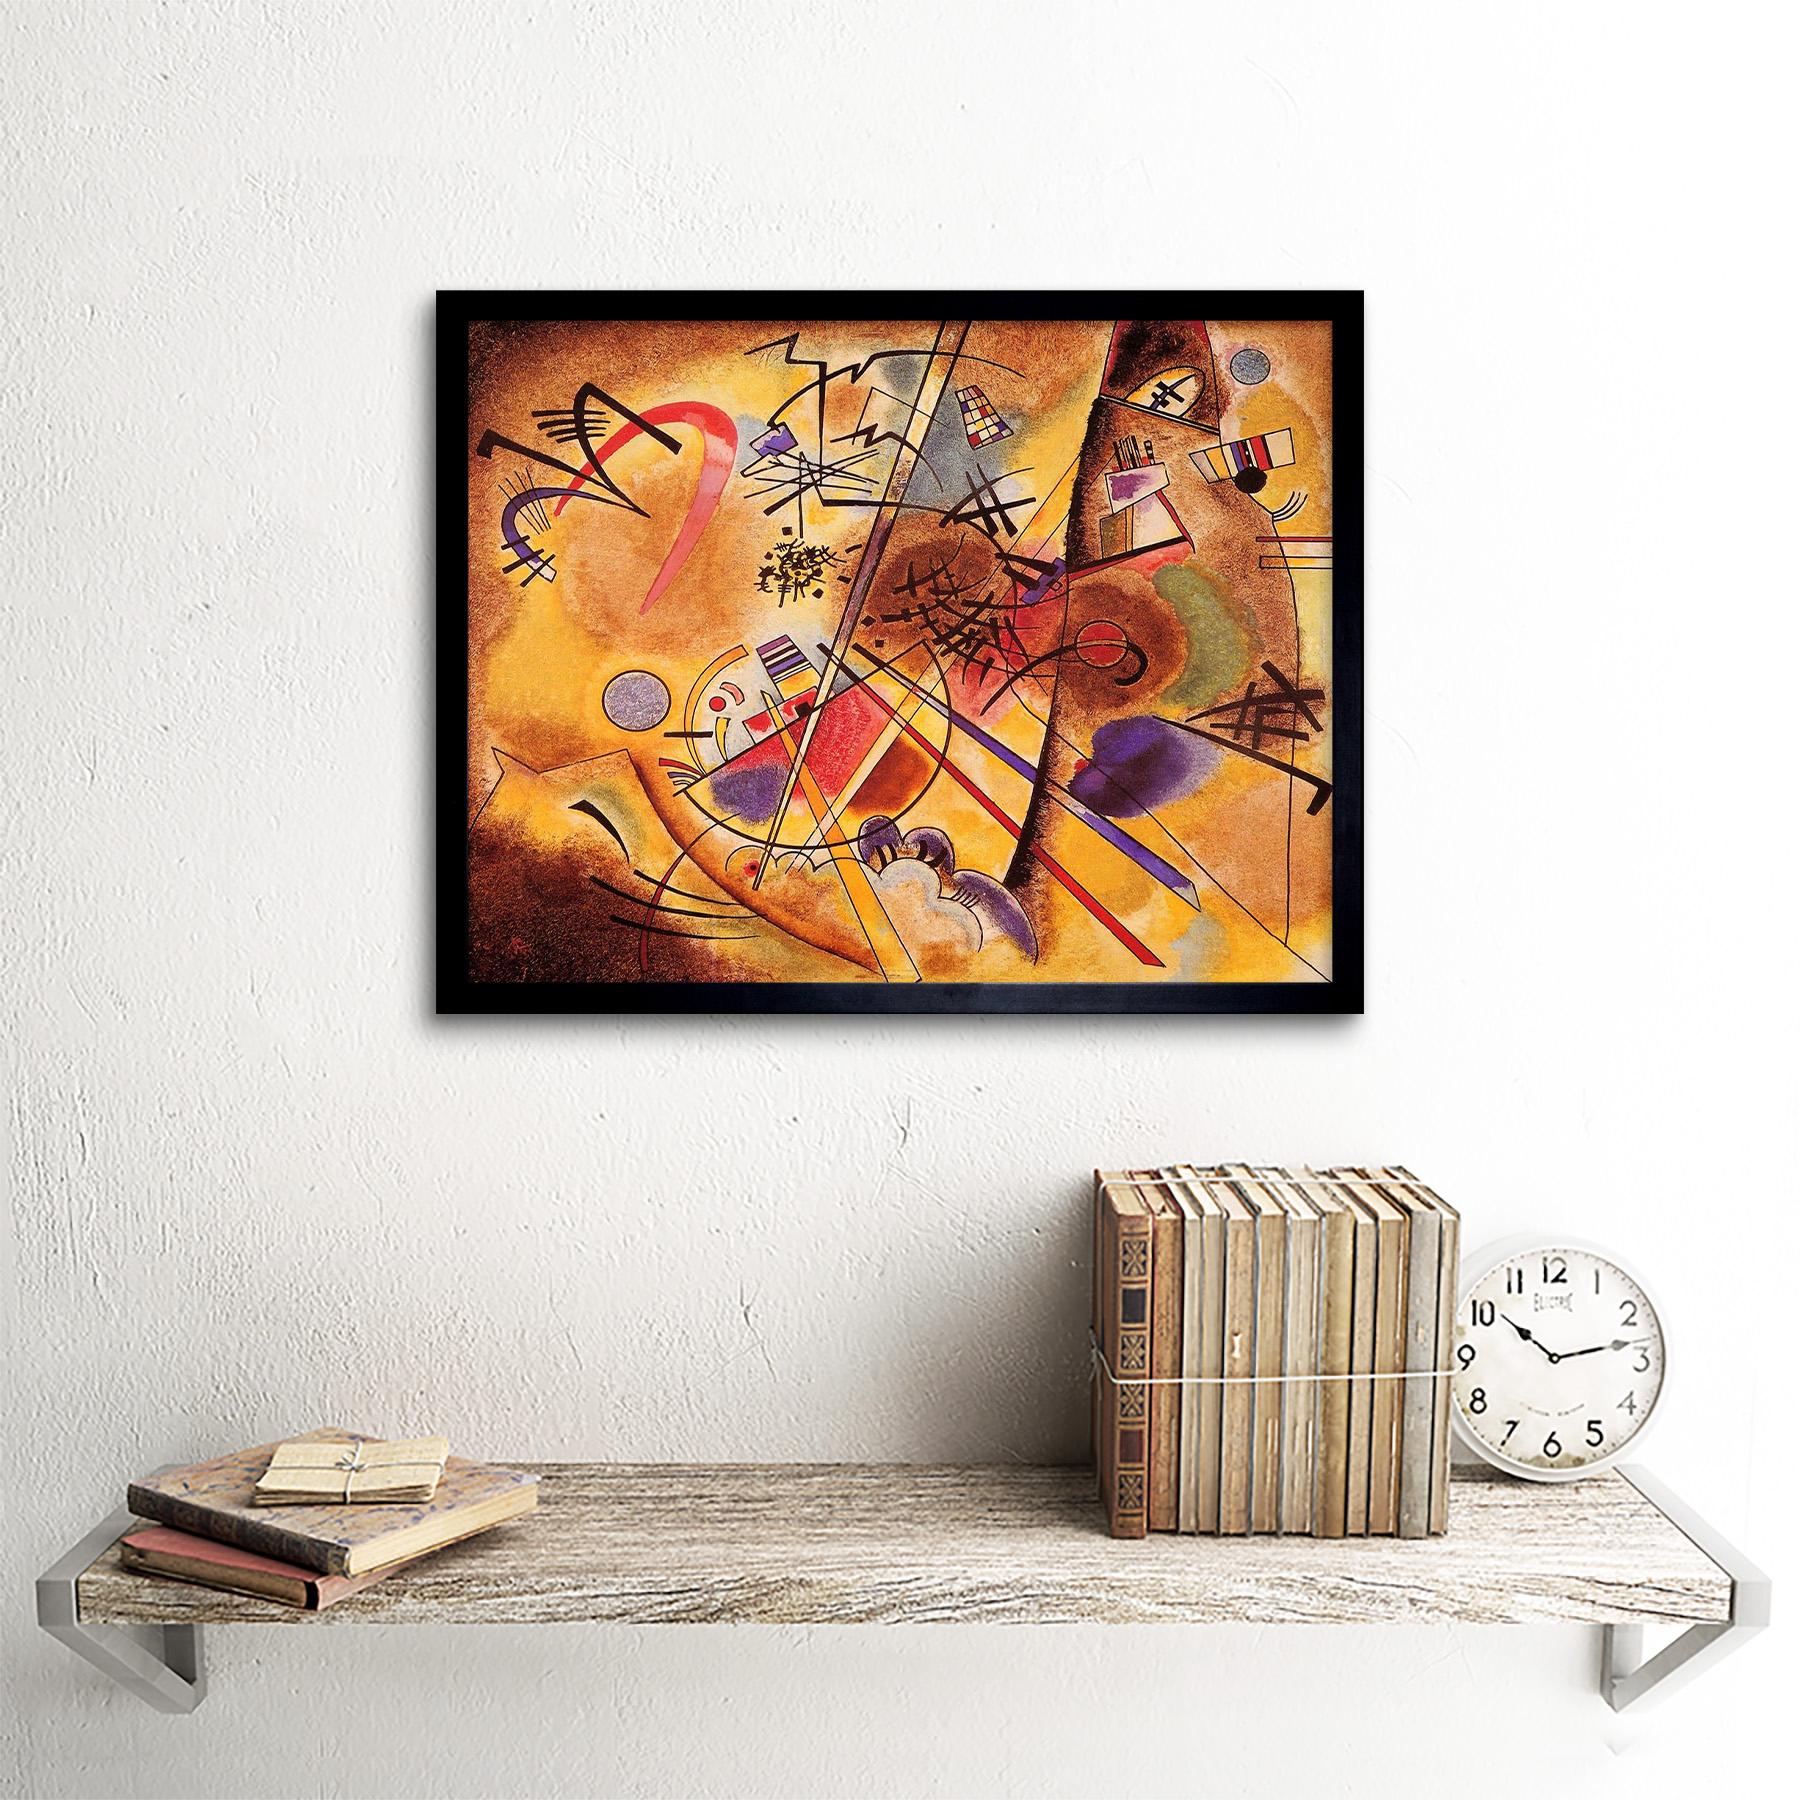 Painting Mucha Dreaming Framed Art Print 12x16 Inch